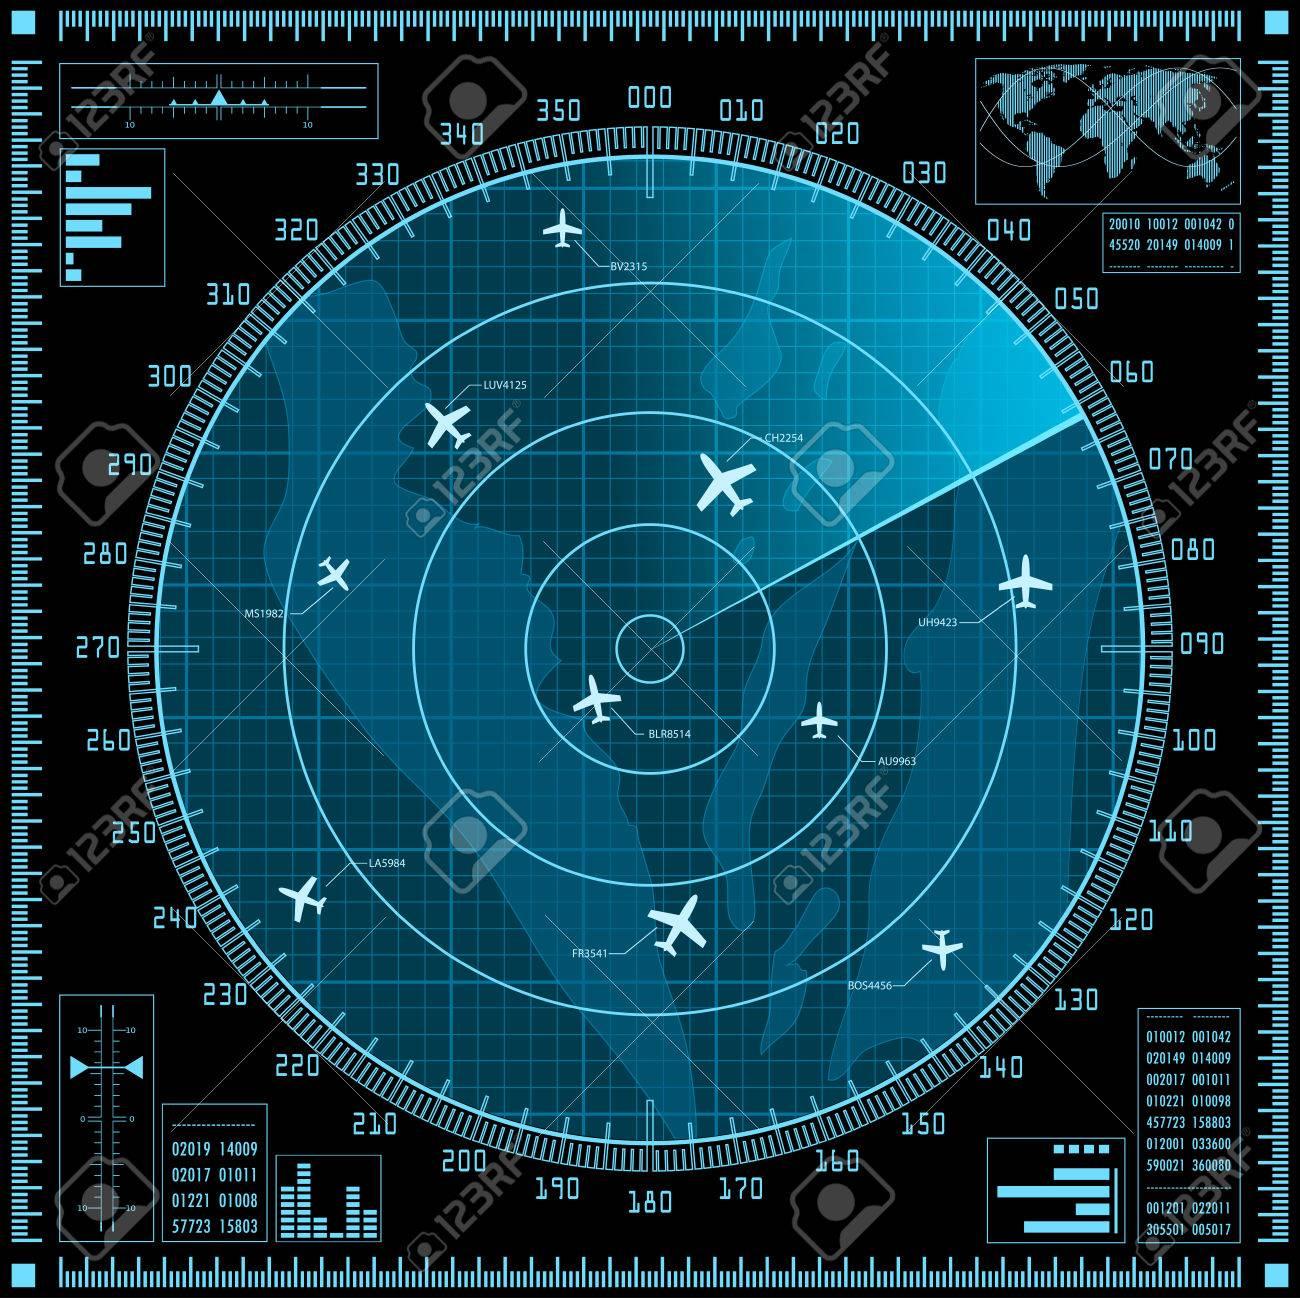 Blue radar screen with planes. - 30906387